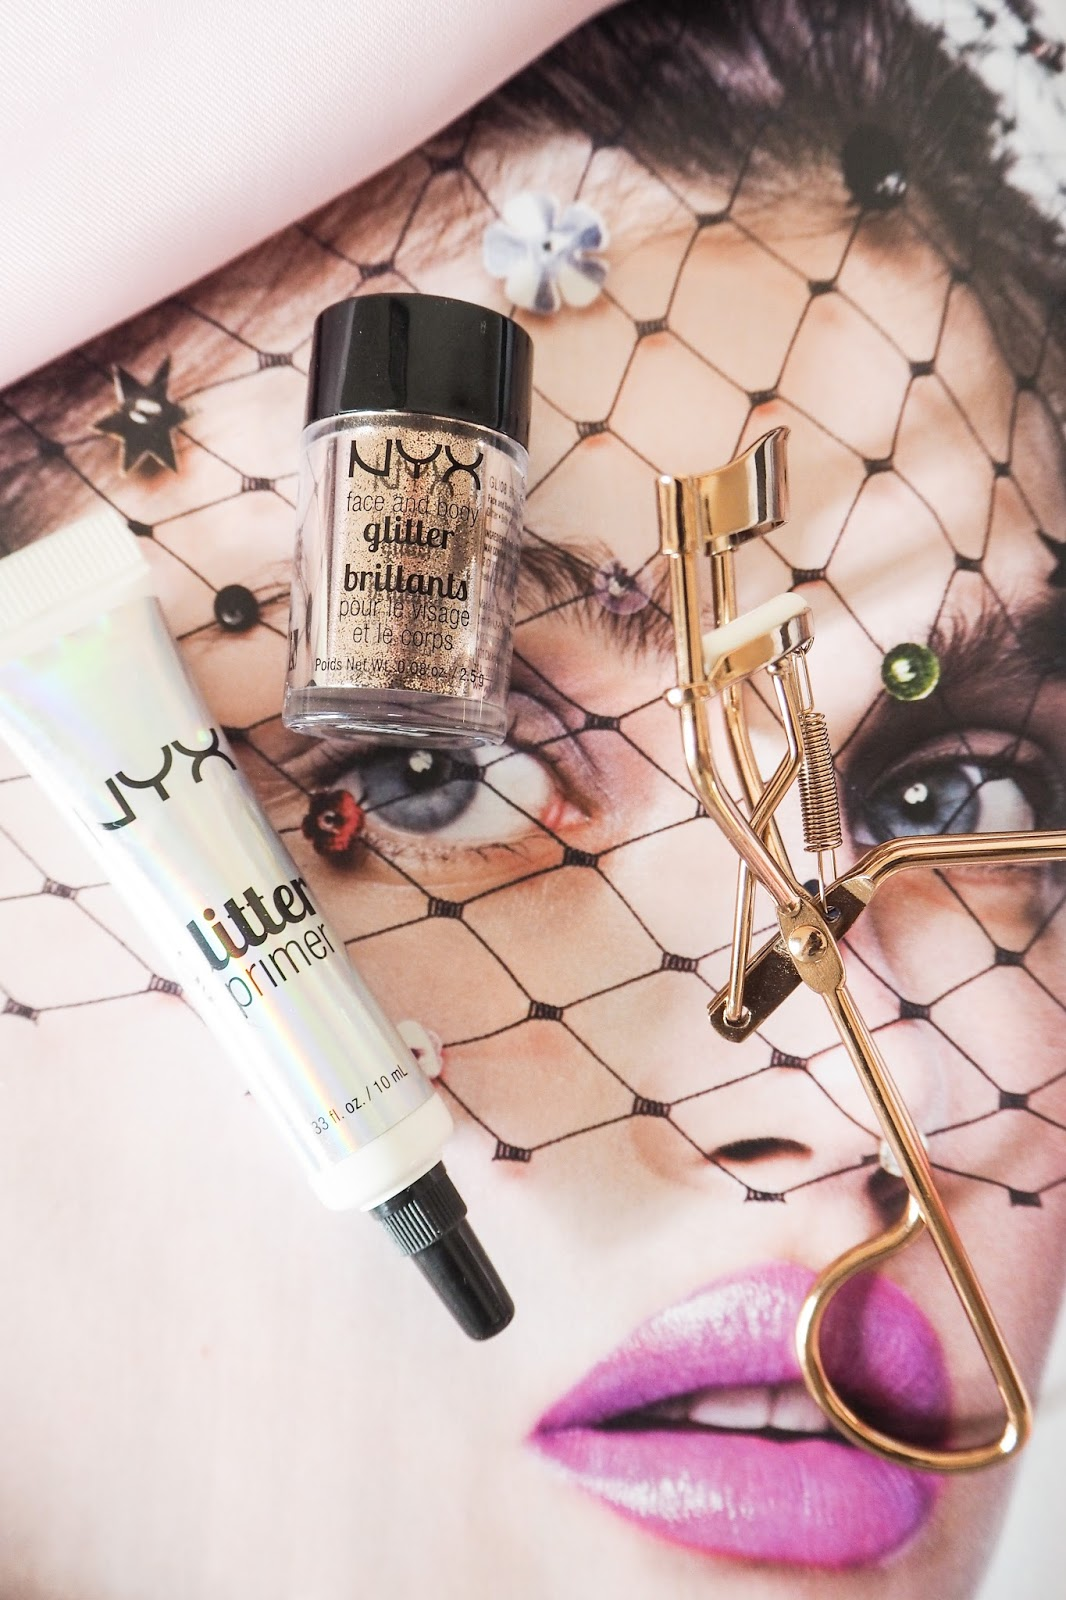 NYX Glitter Primer and Face & Body Glitter in 08